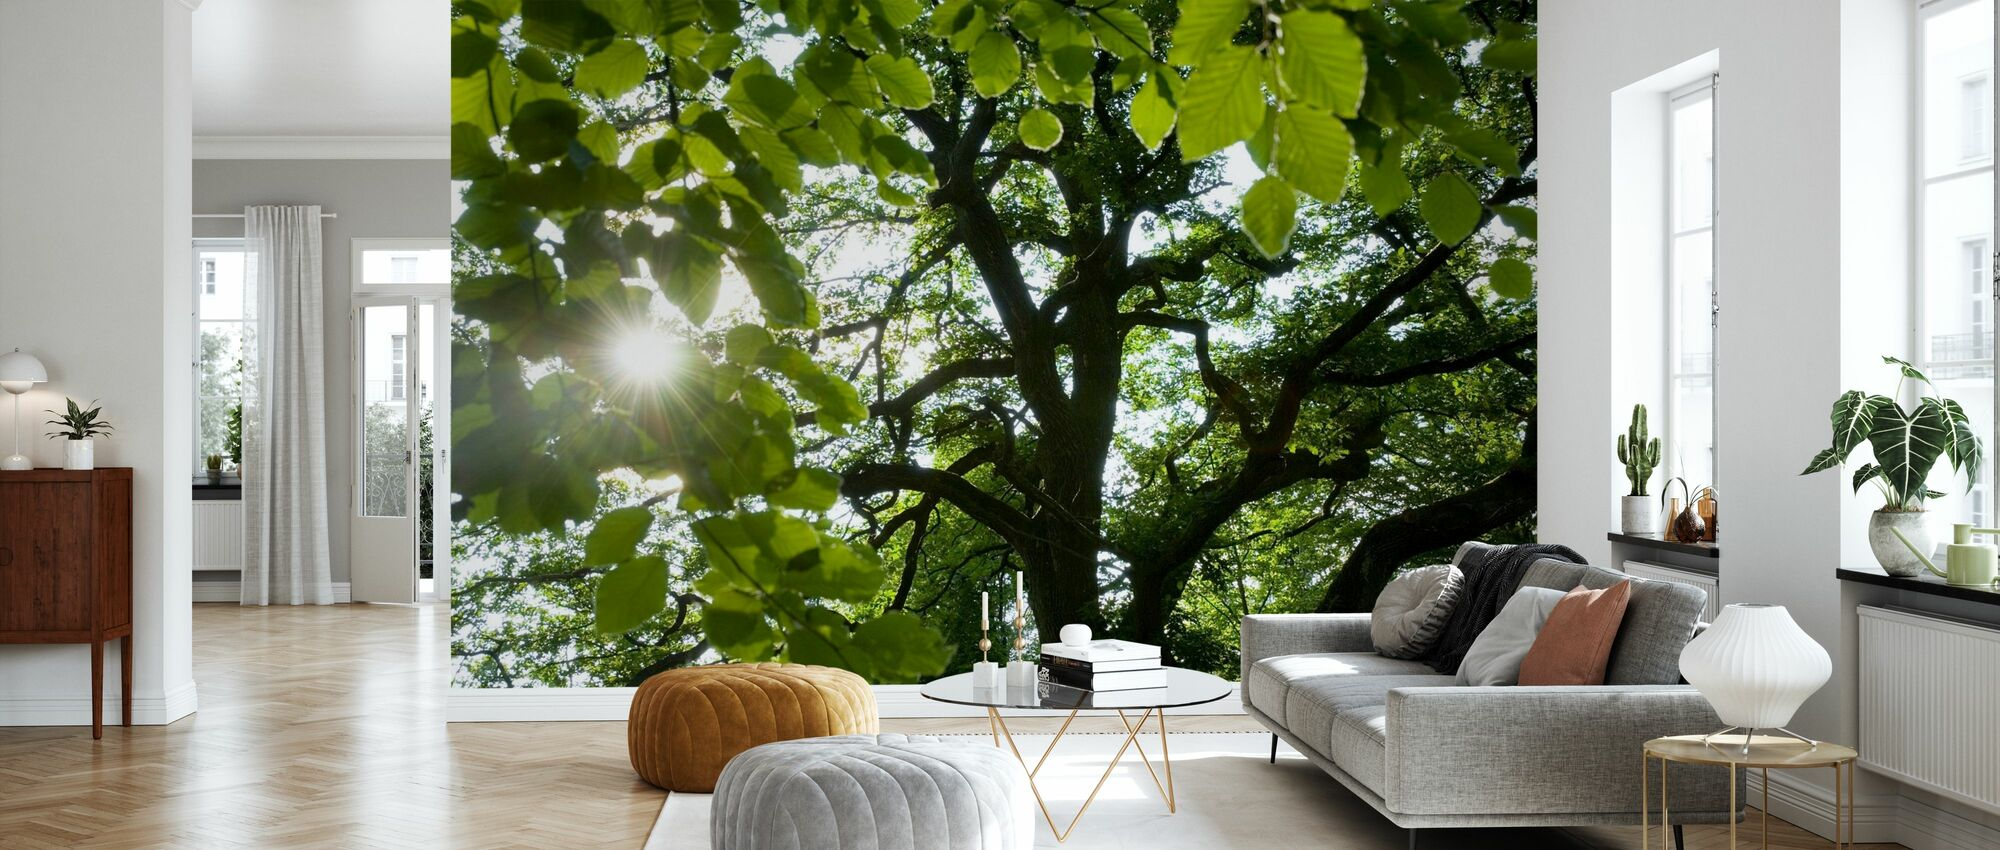 Forest Scene - Tapet - Stue